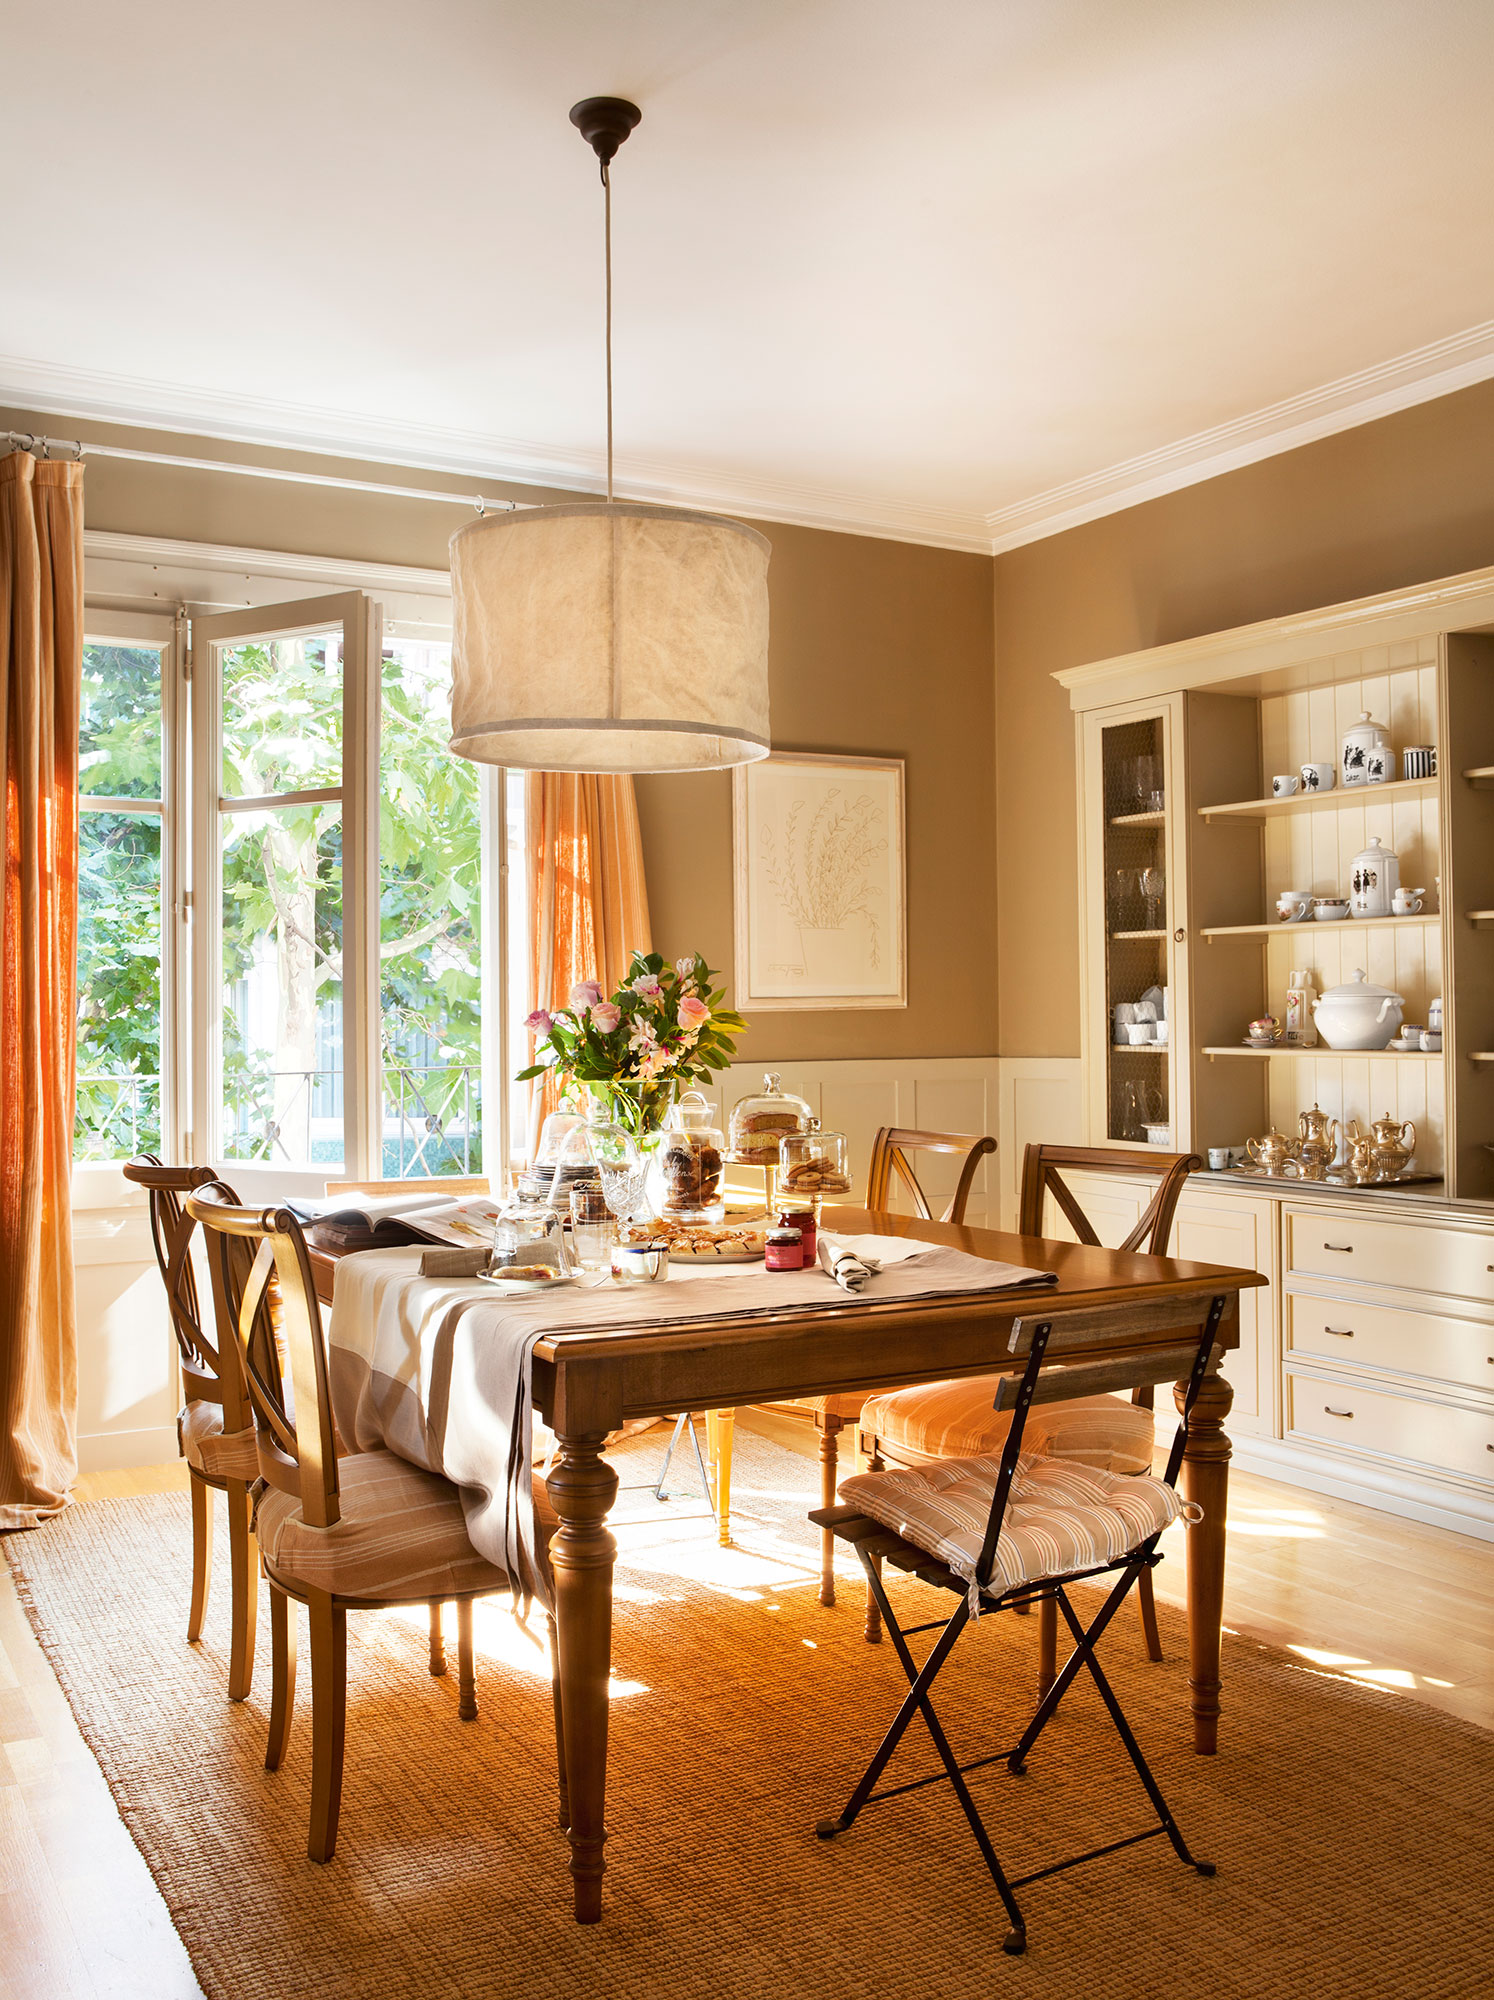 Mesas de comedor c mo elegir tu mesa de comedor perfecta for Mesas de cristal y madera para comedor